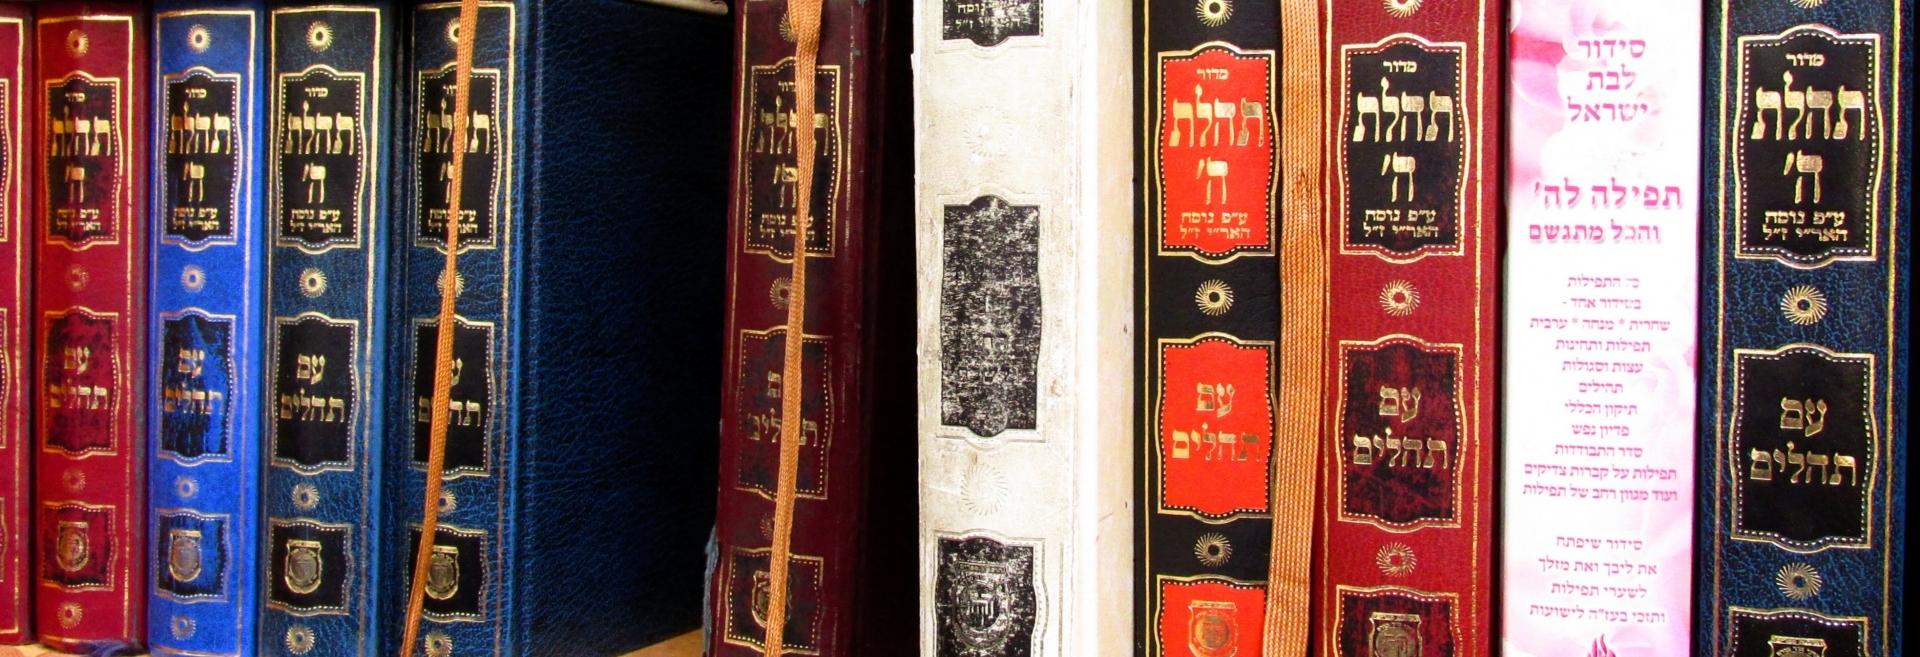 jewish-prayer-books-israel.jpg